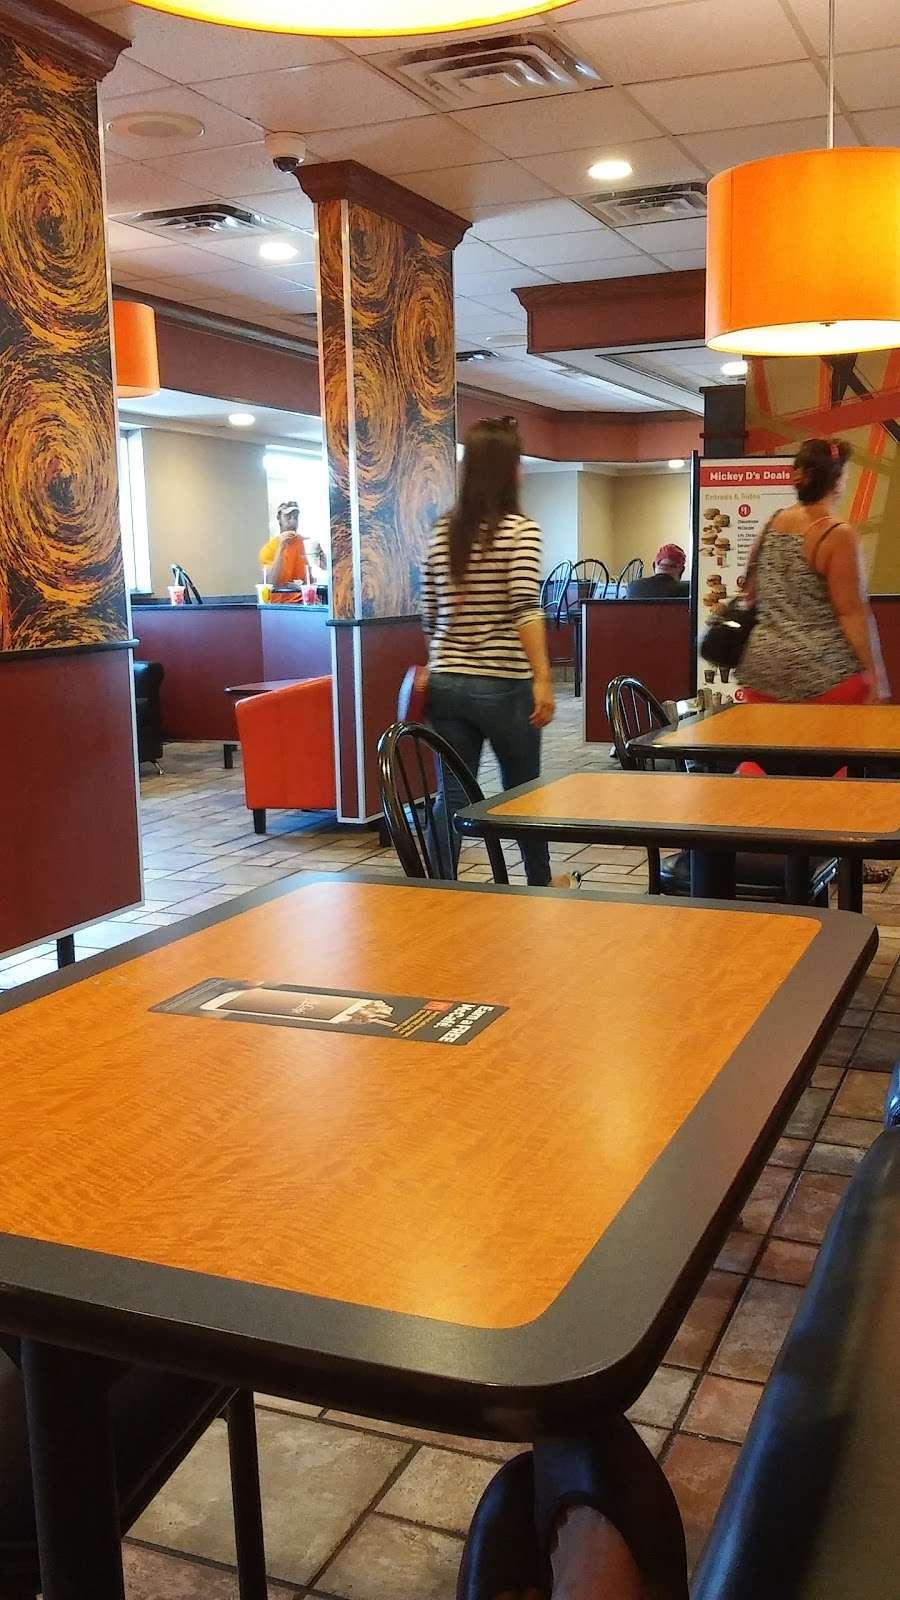 McDonalds - cafe  | Photo 6 of 9 | Address: 805 E Jefferson St, Tipton, IN 46072, USA | Phone: (765) 675-7645